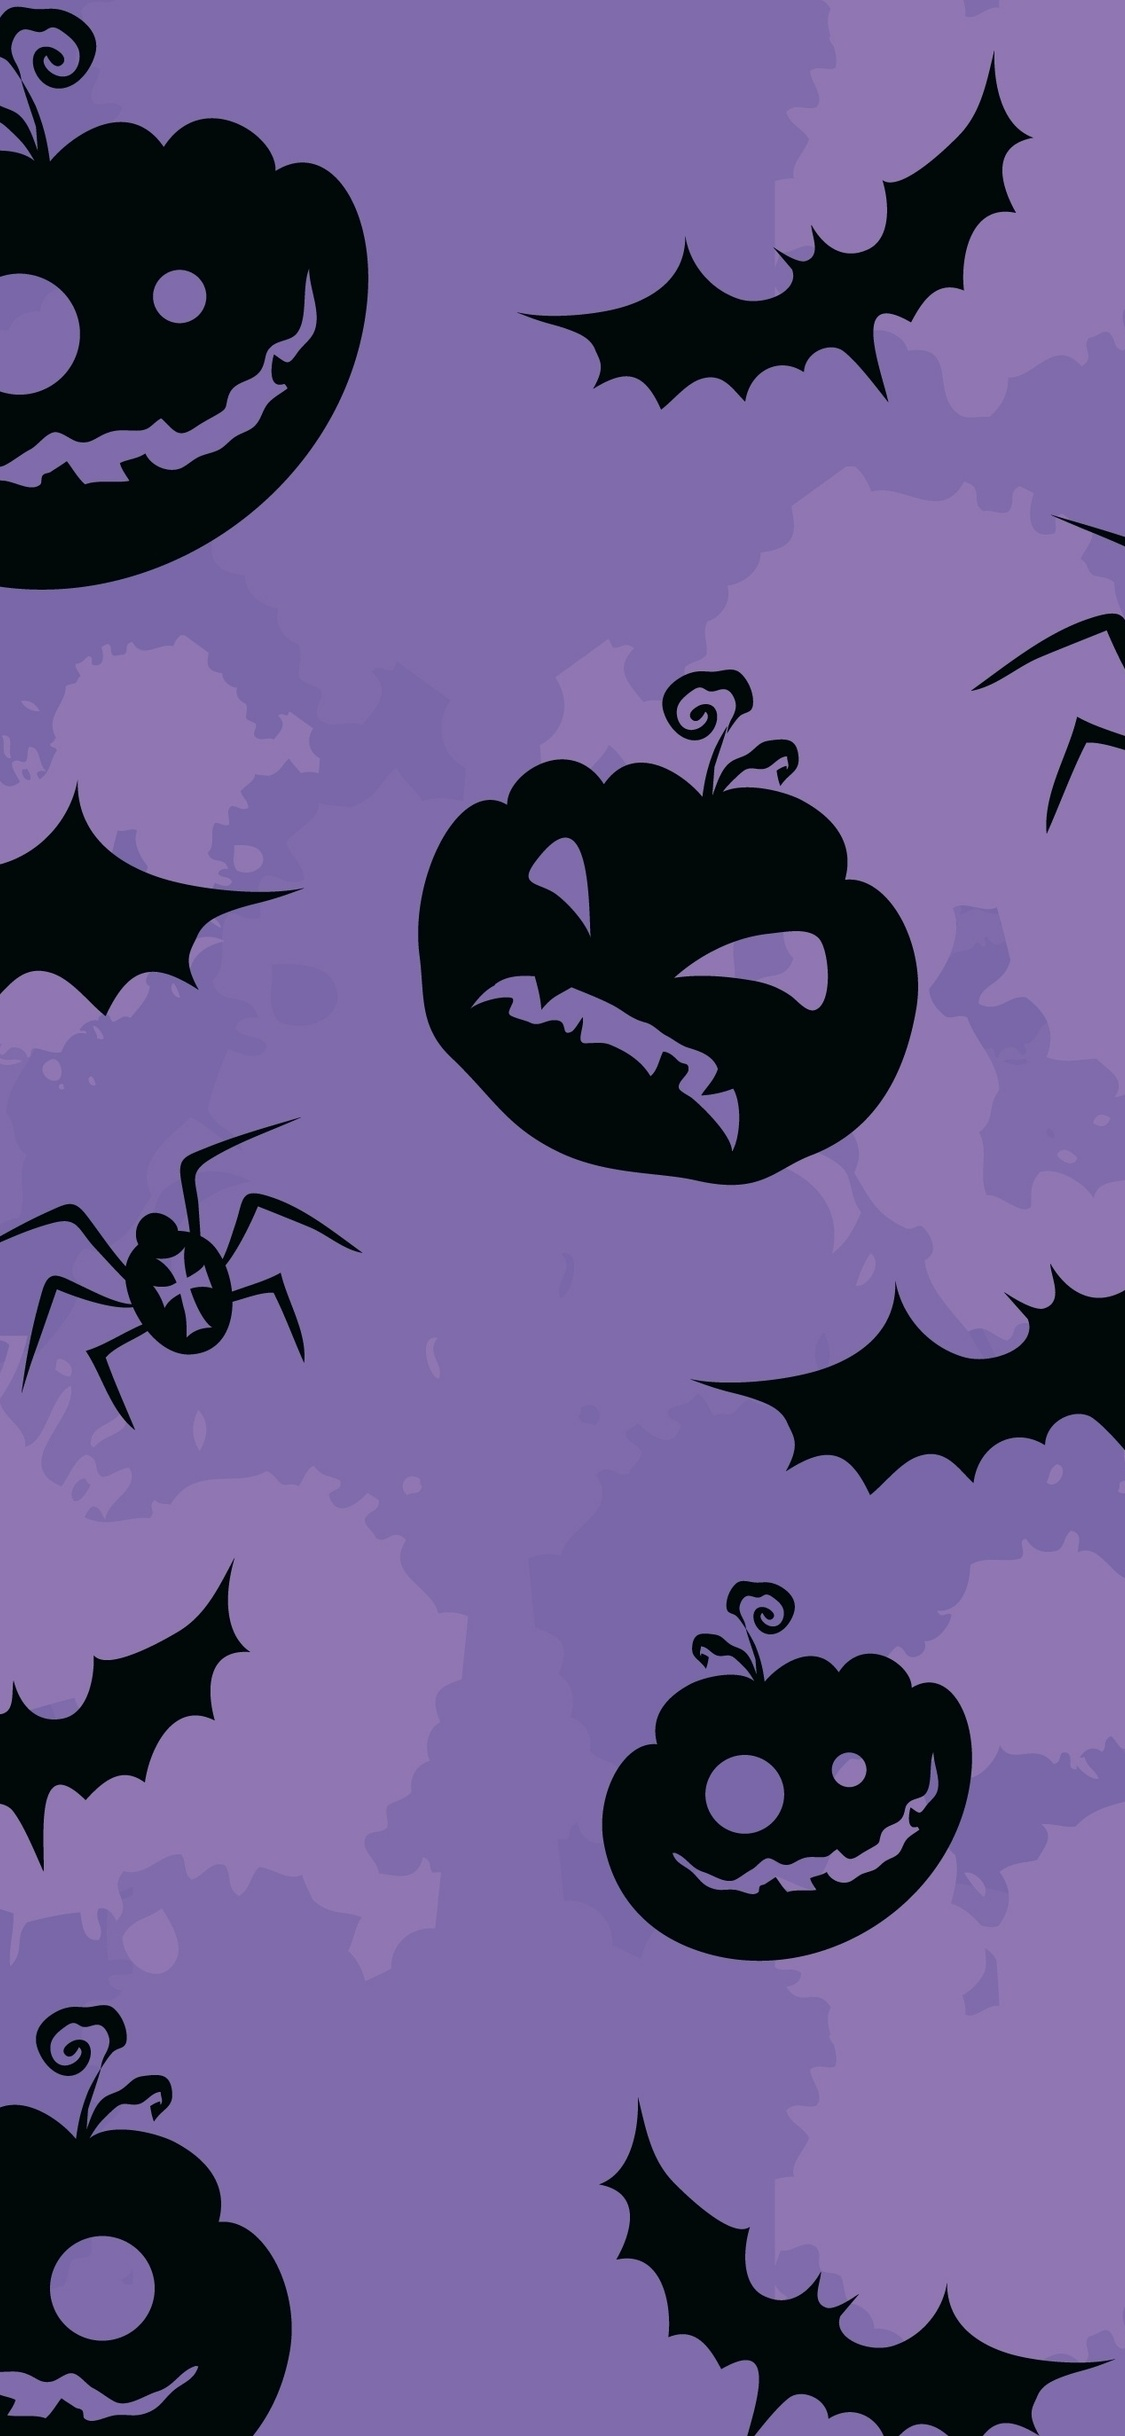 1125x2436 Halloween 4k Background Iphone Xs Iphone 10 Iphone